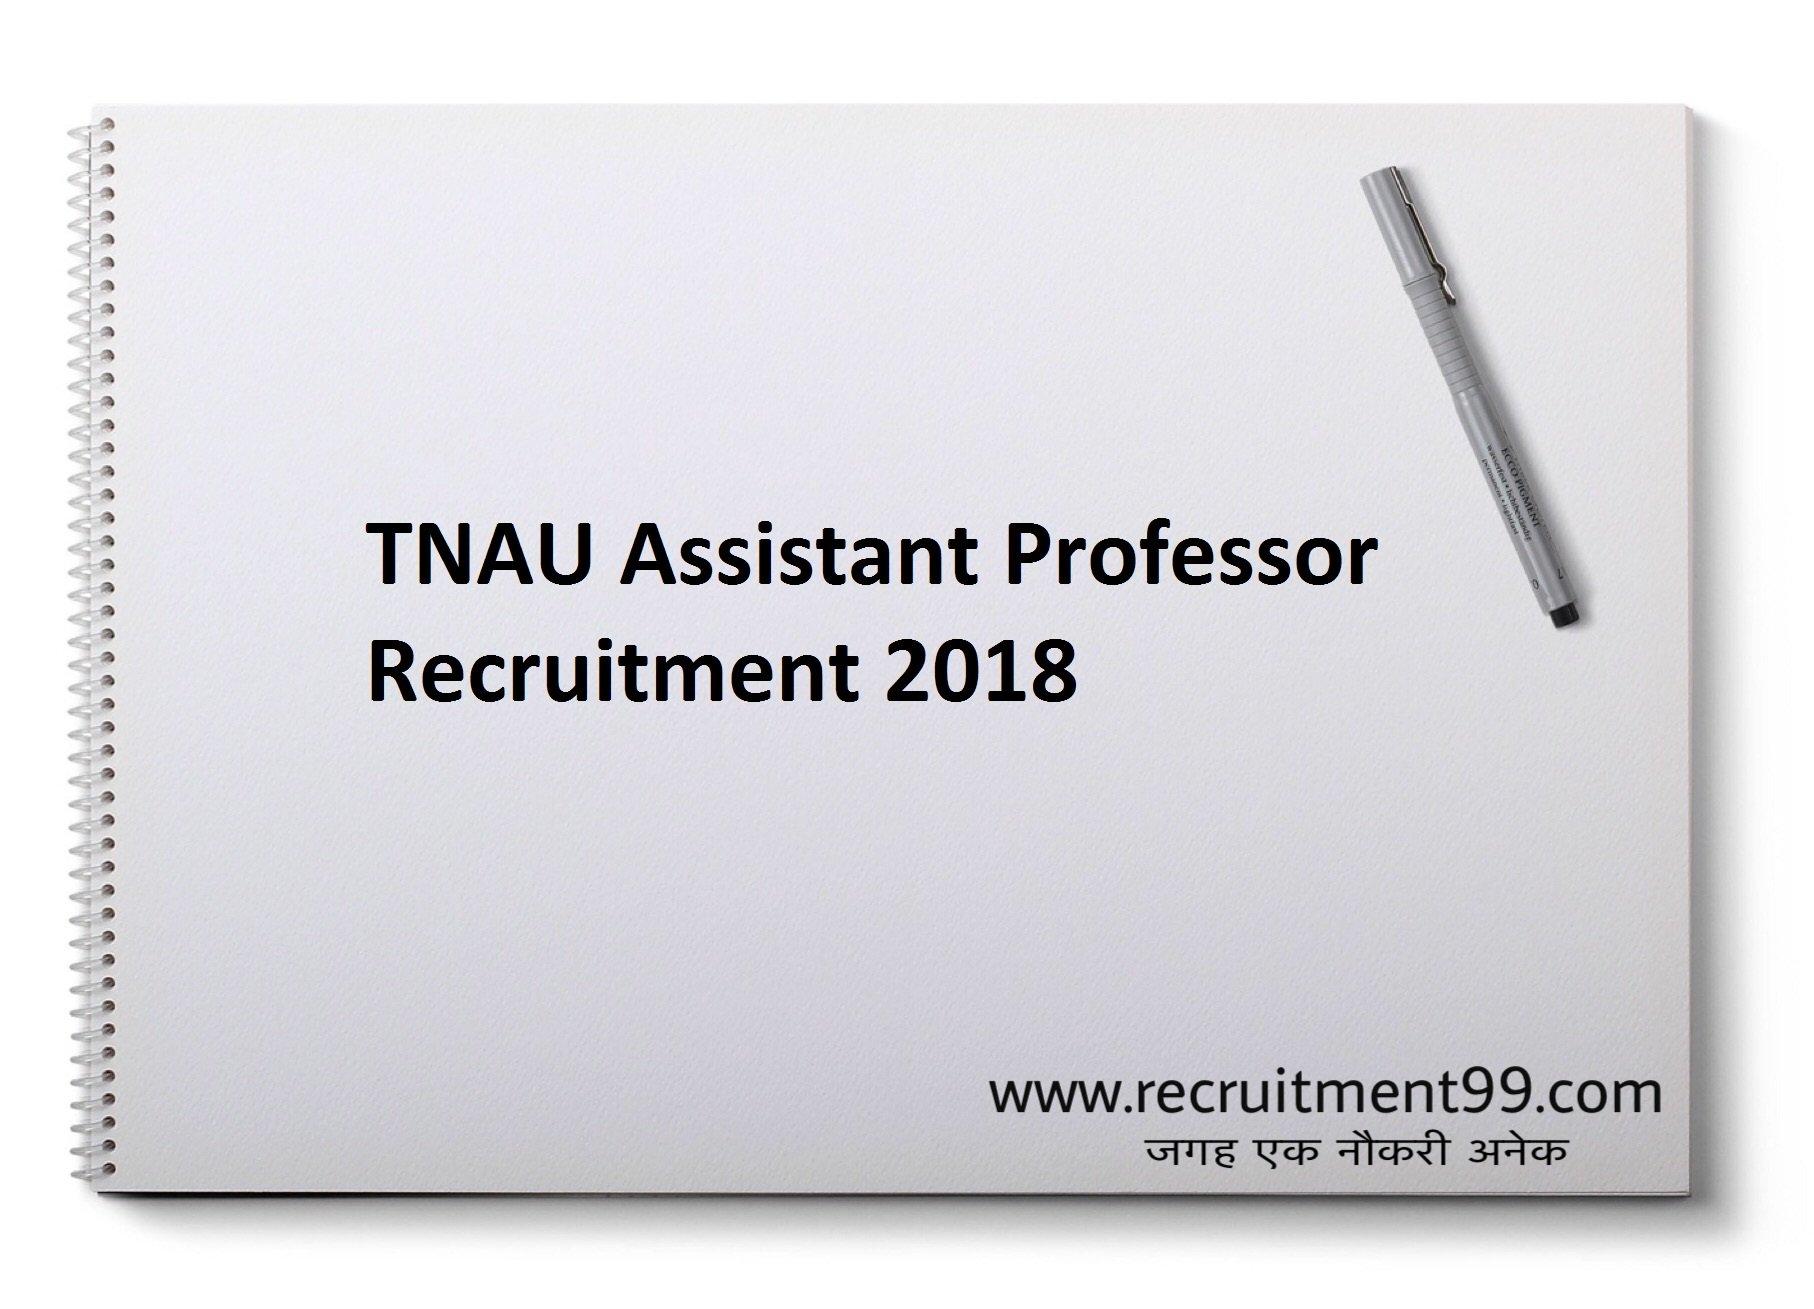 TNAU Assistant Professor Recruitment Hall Ticket Result 2018